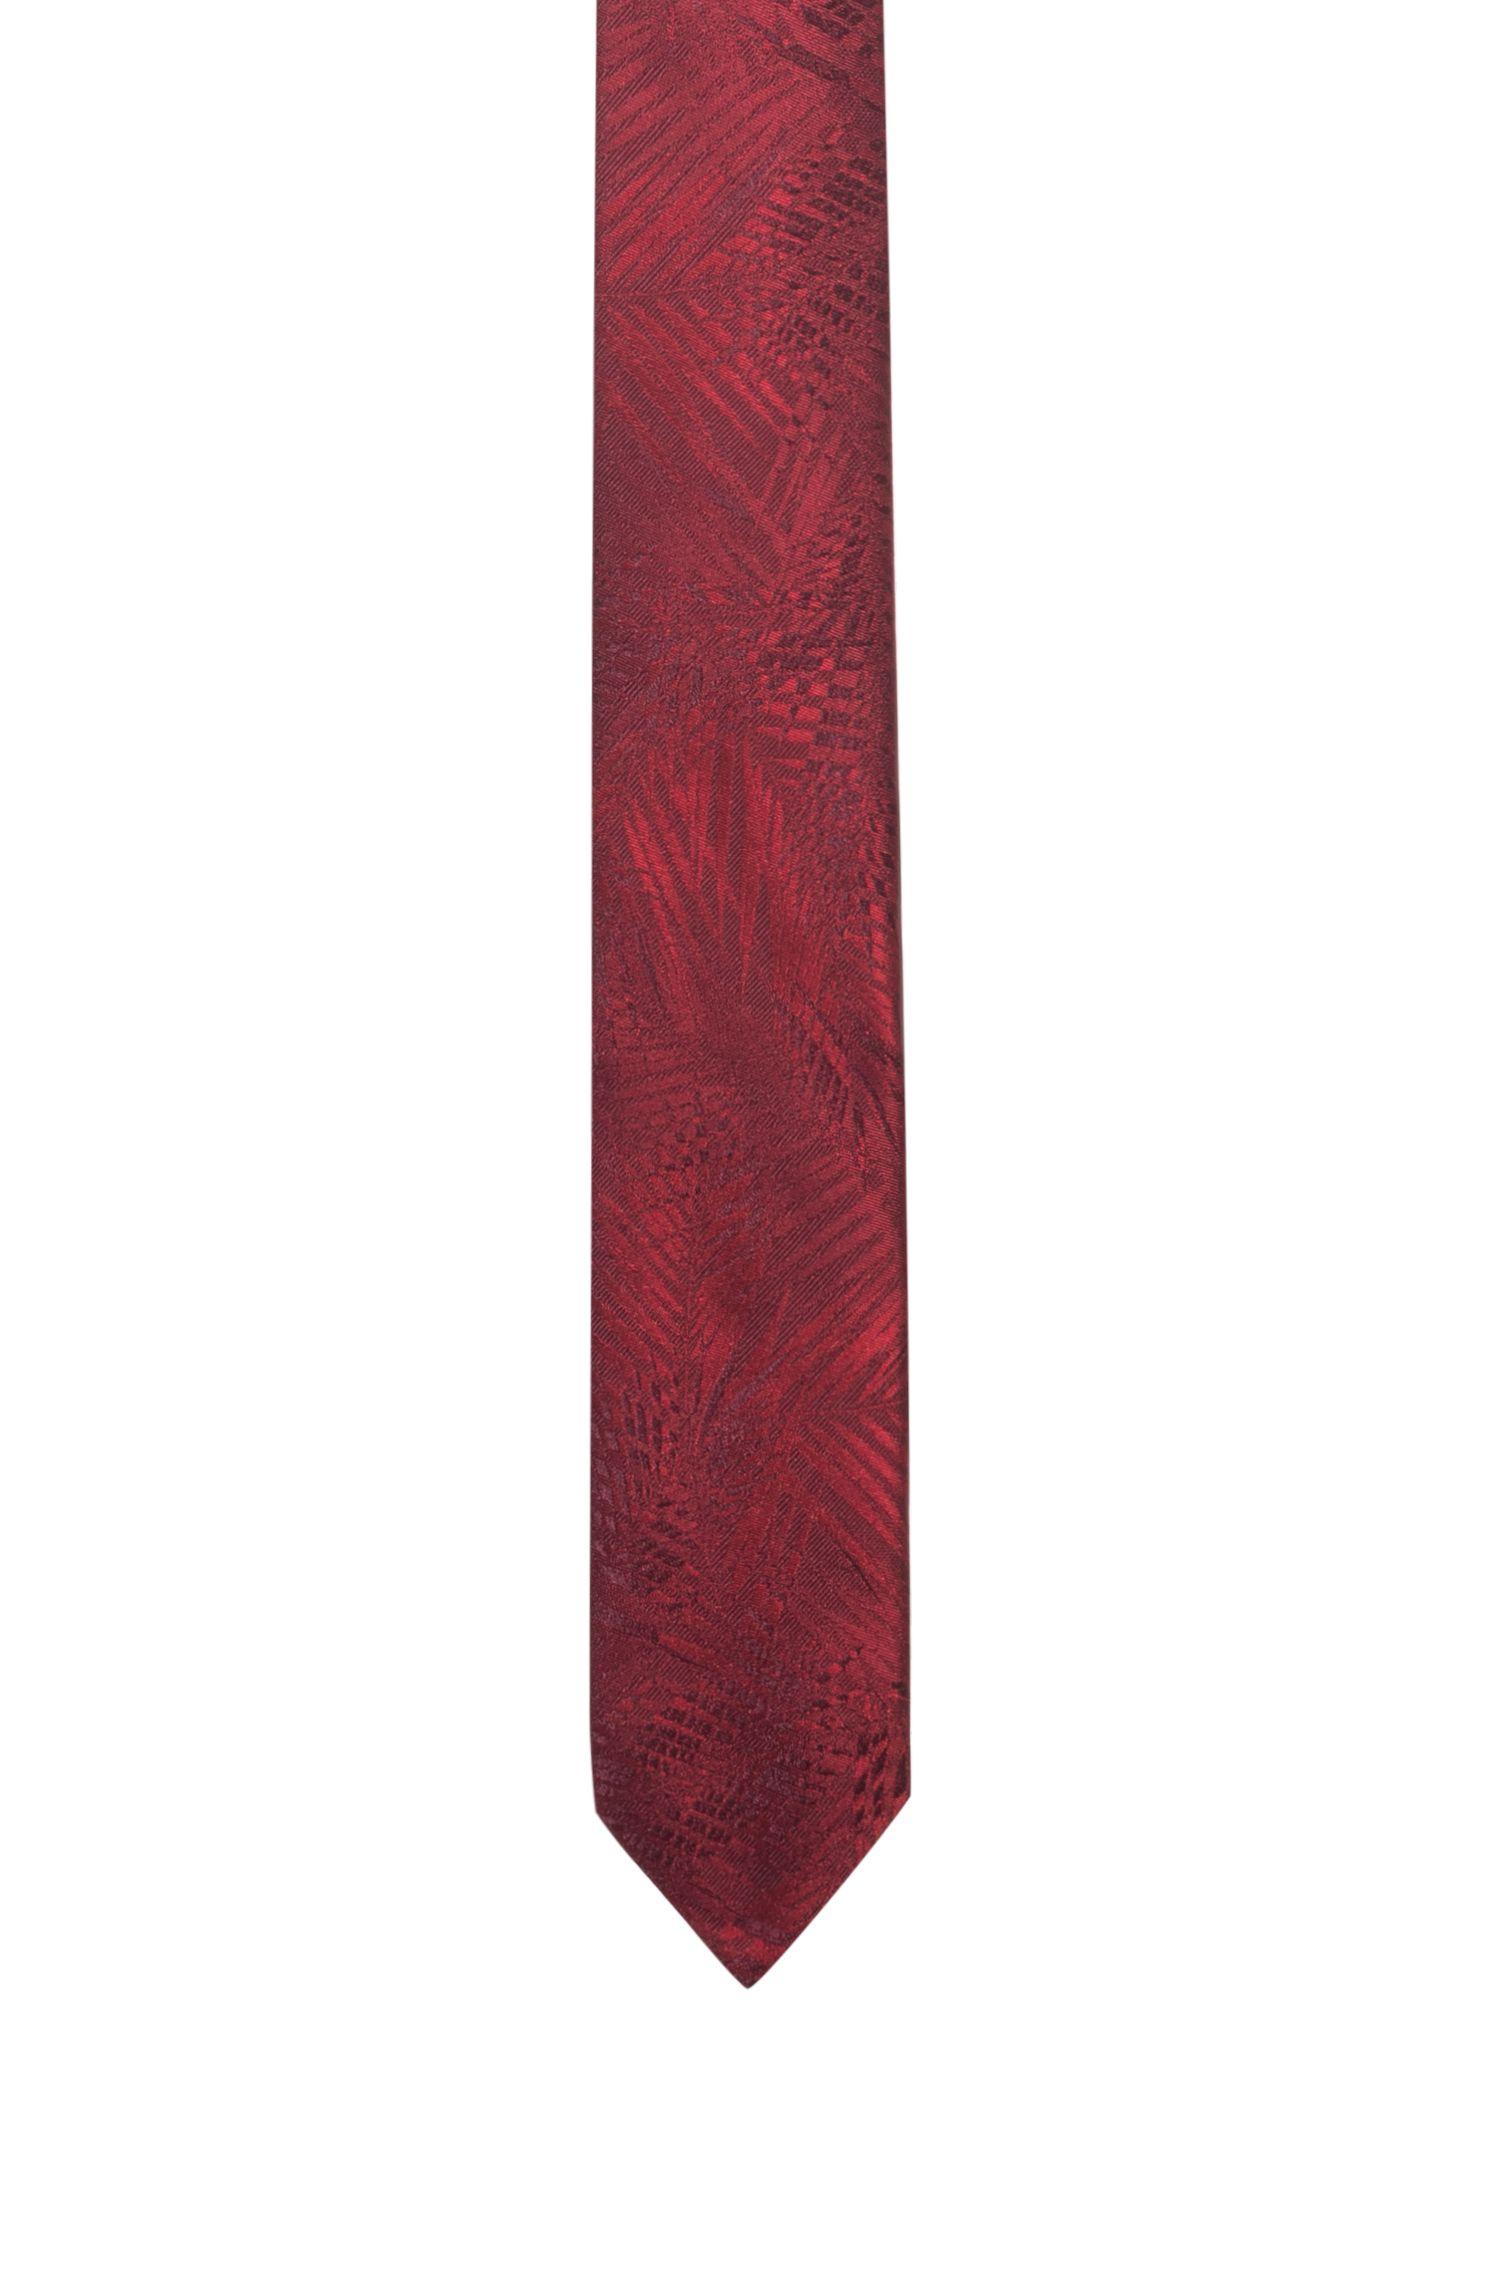 Gemusterte Krawatte aus reinem Seiden-Jacquard, Hellrosa